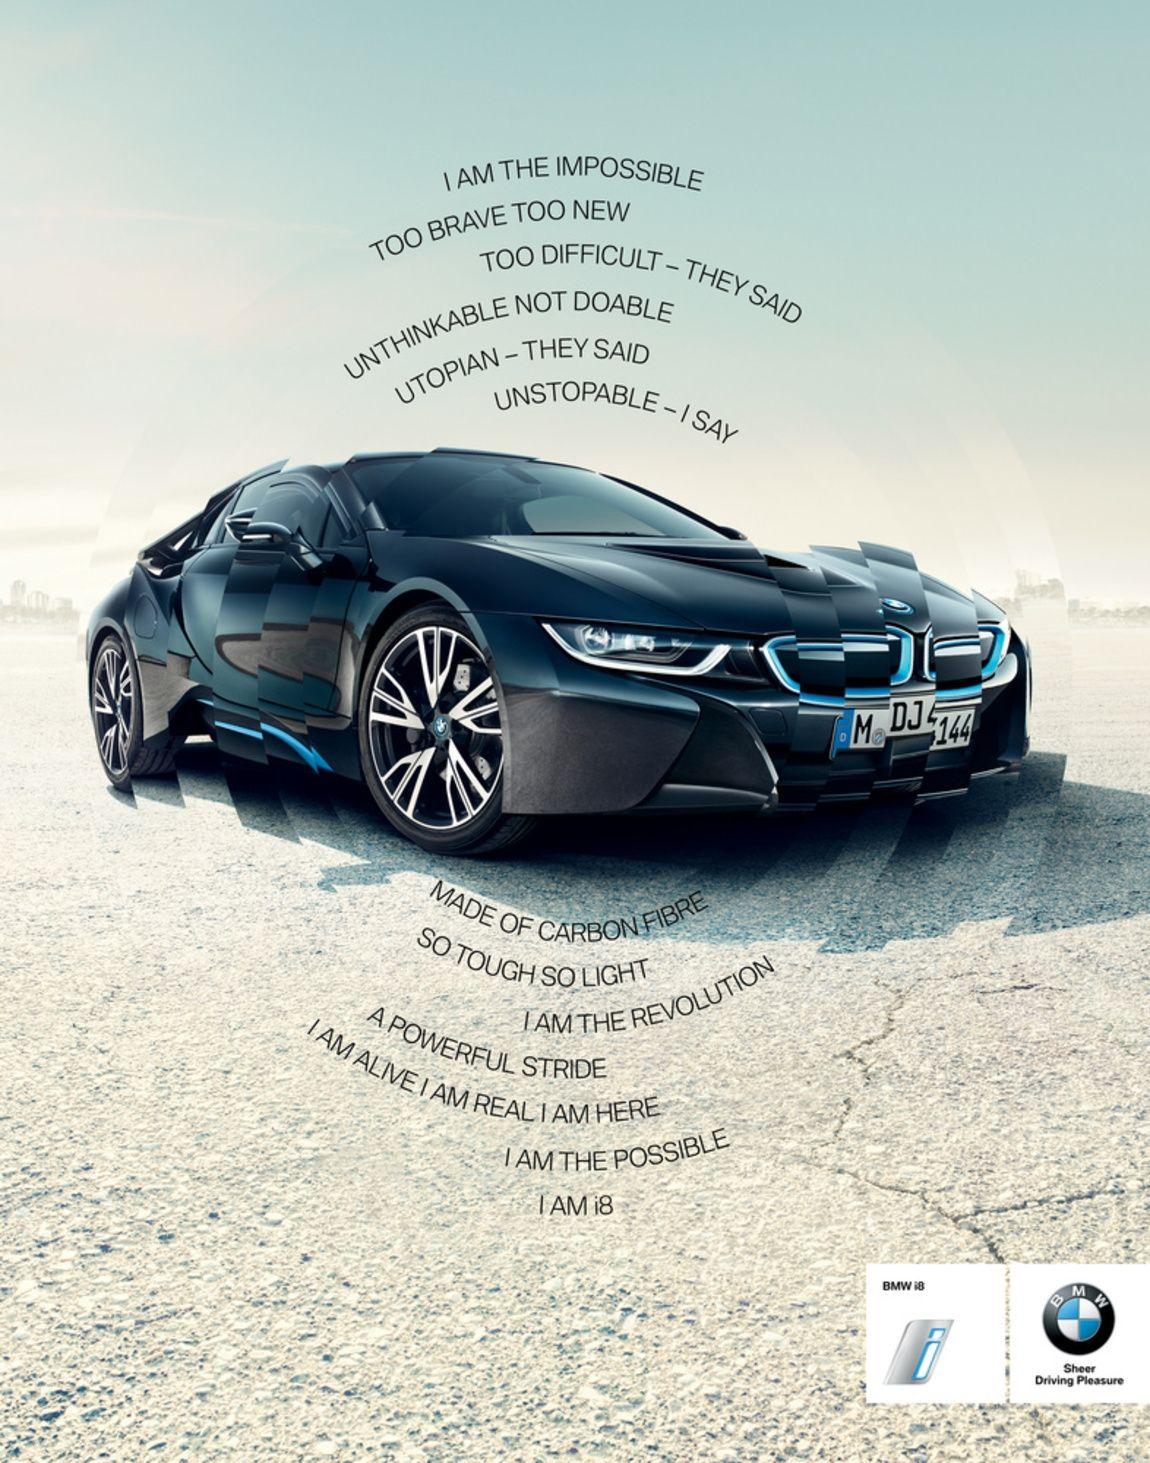 Bmw I8 I Am The Impossible Mercedes Ev Van Branding Inso